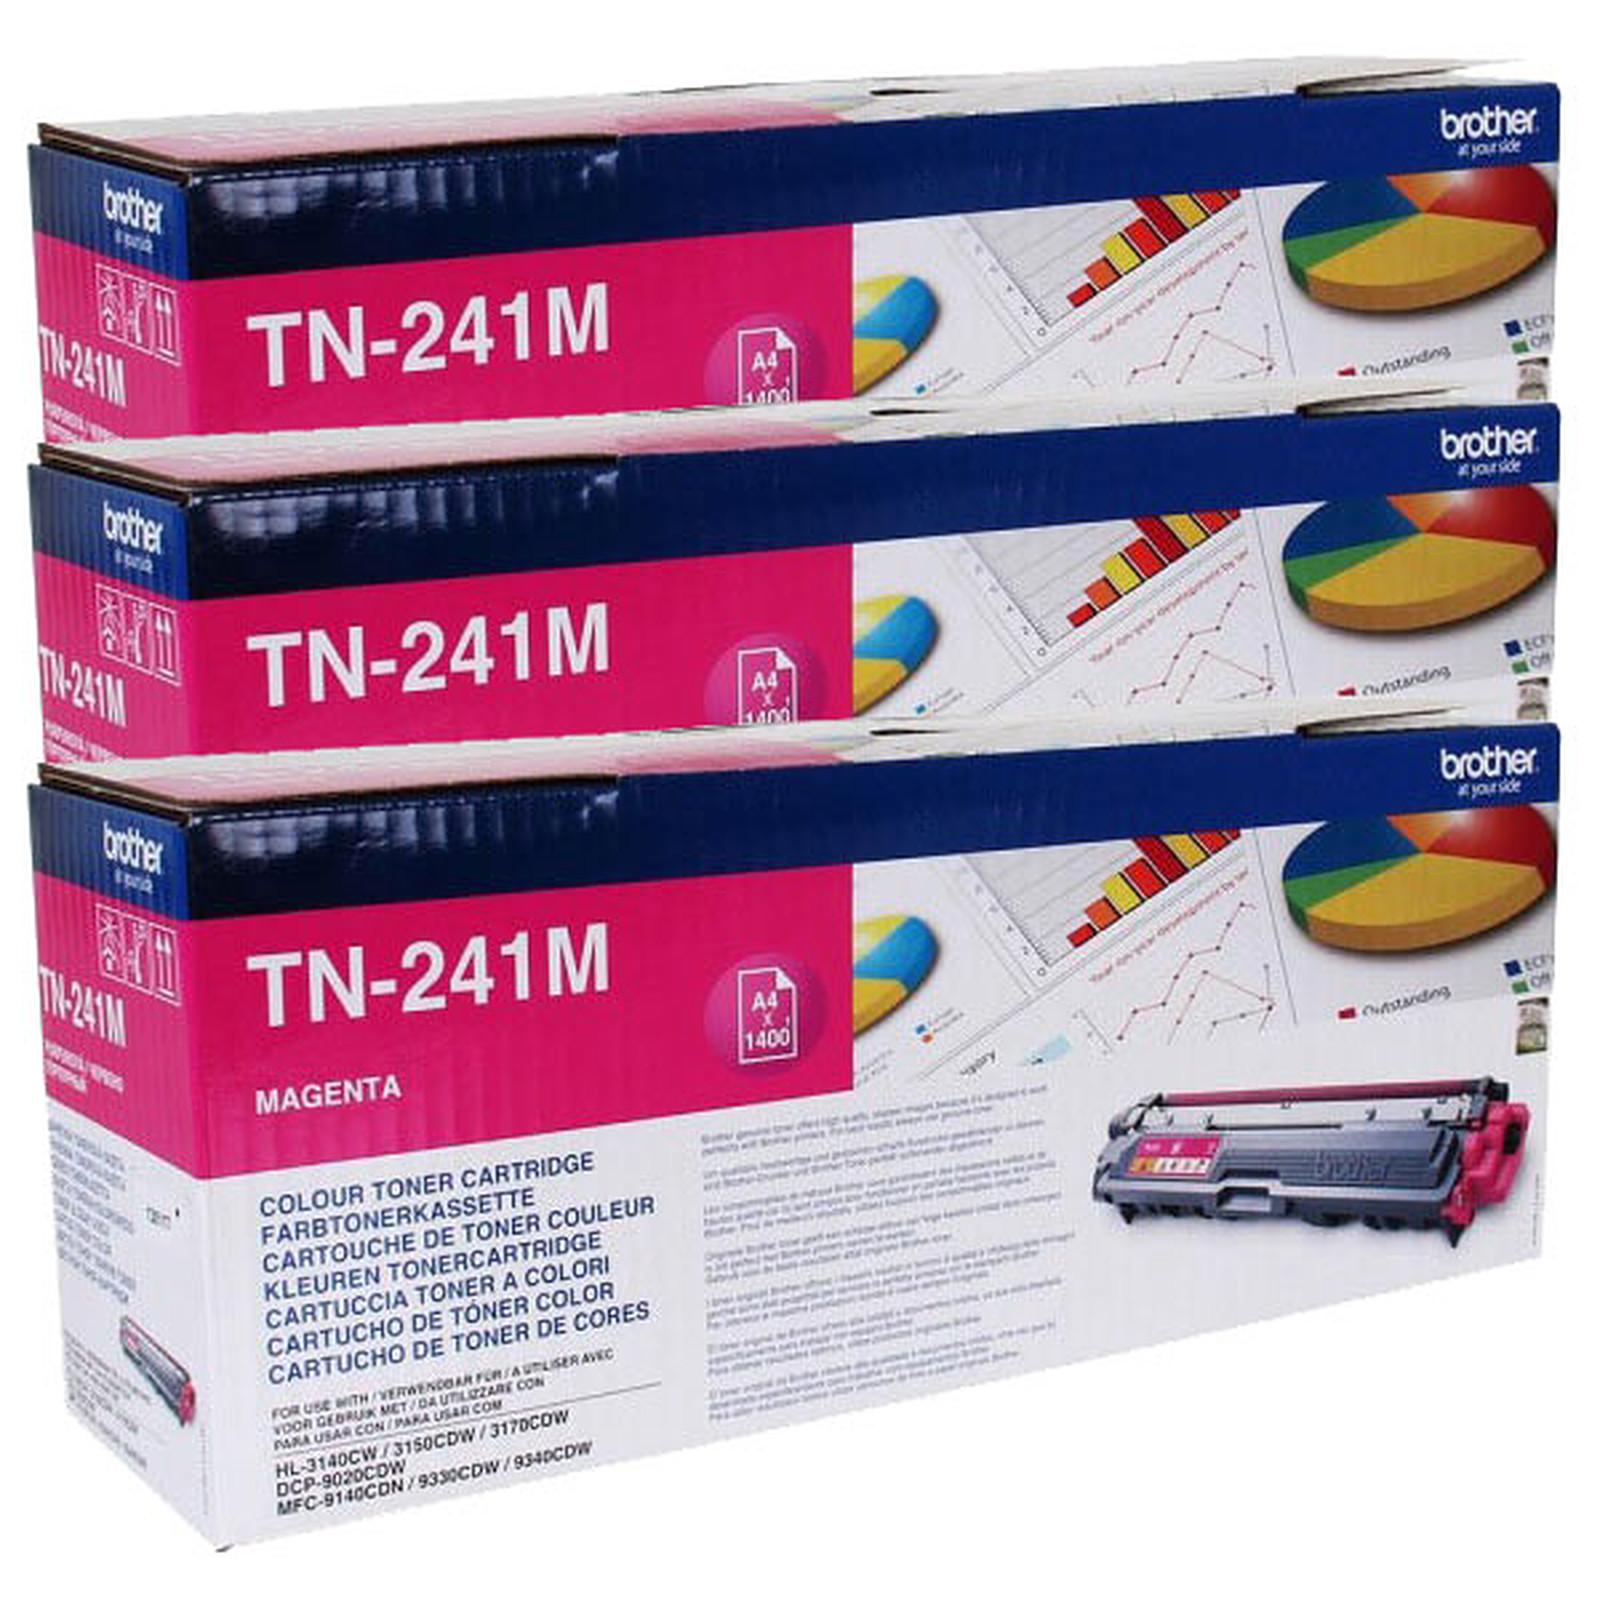 Brother TN-241M x 3